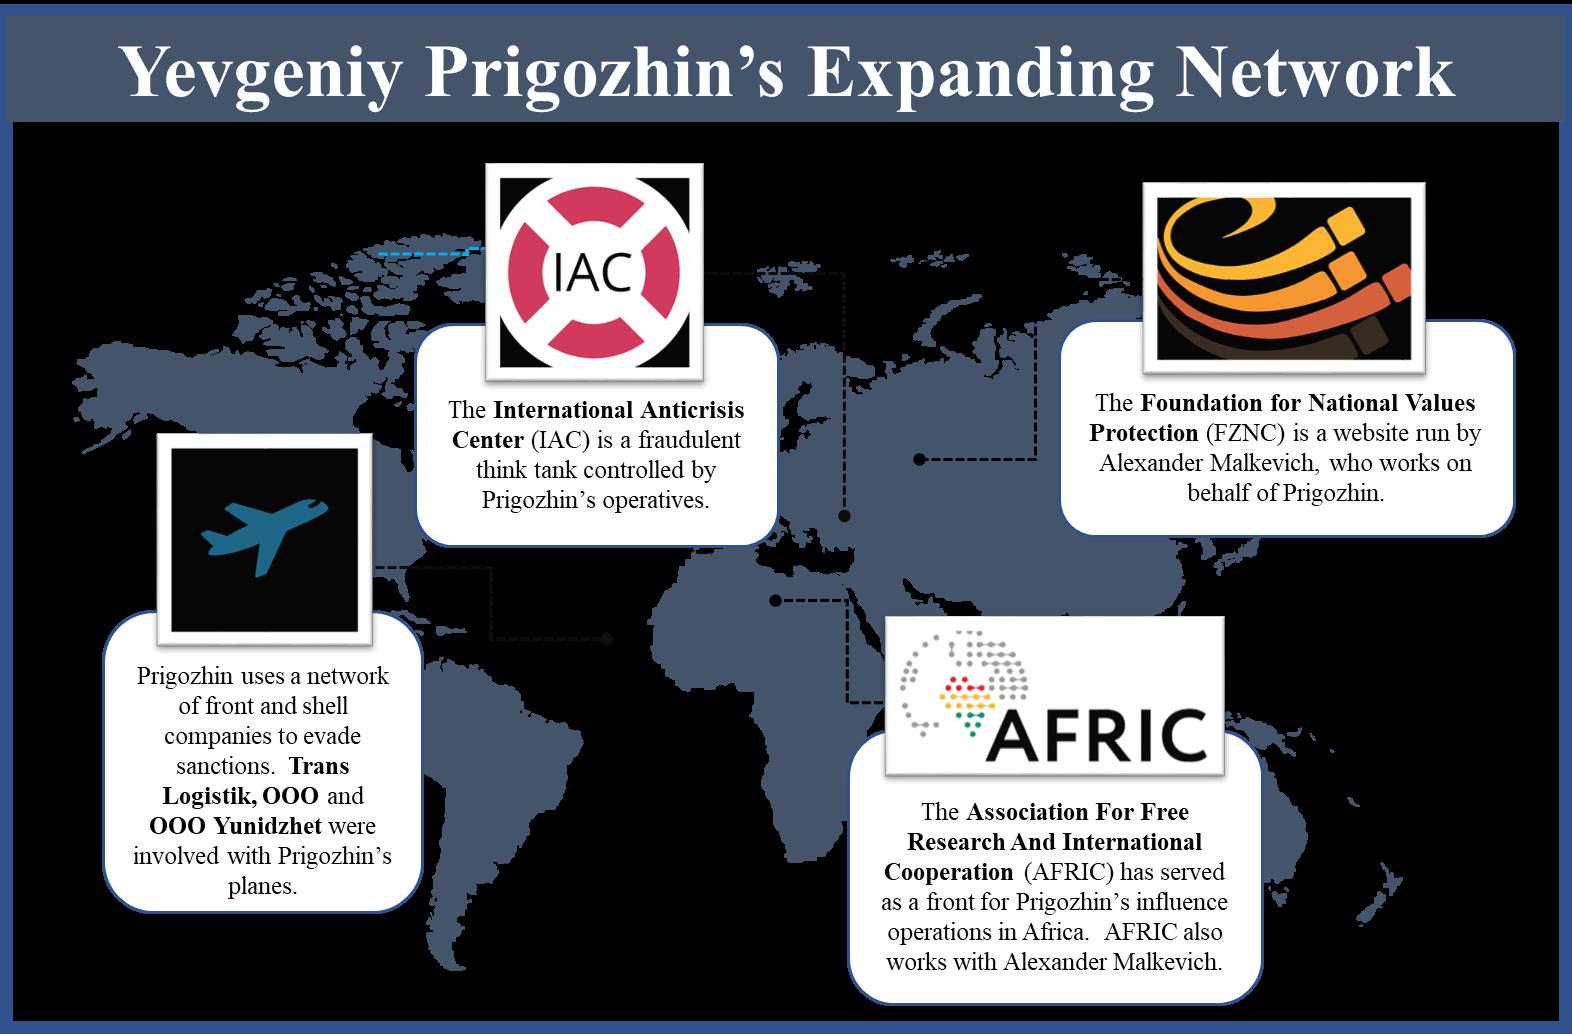 Yevgeniy Prigozhin's Expanding Disinformation Network